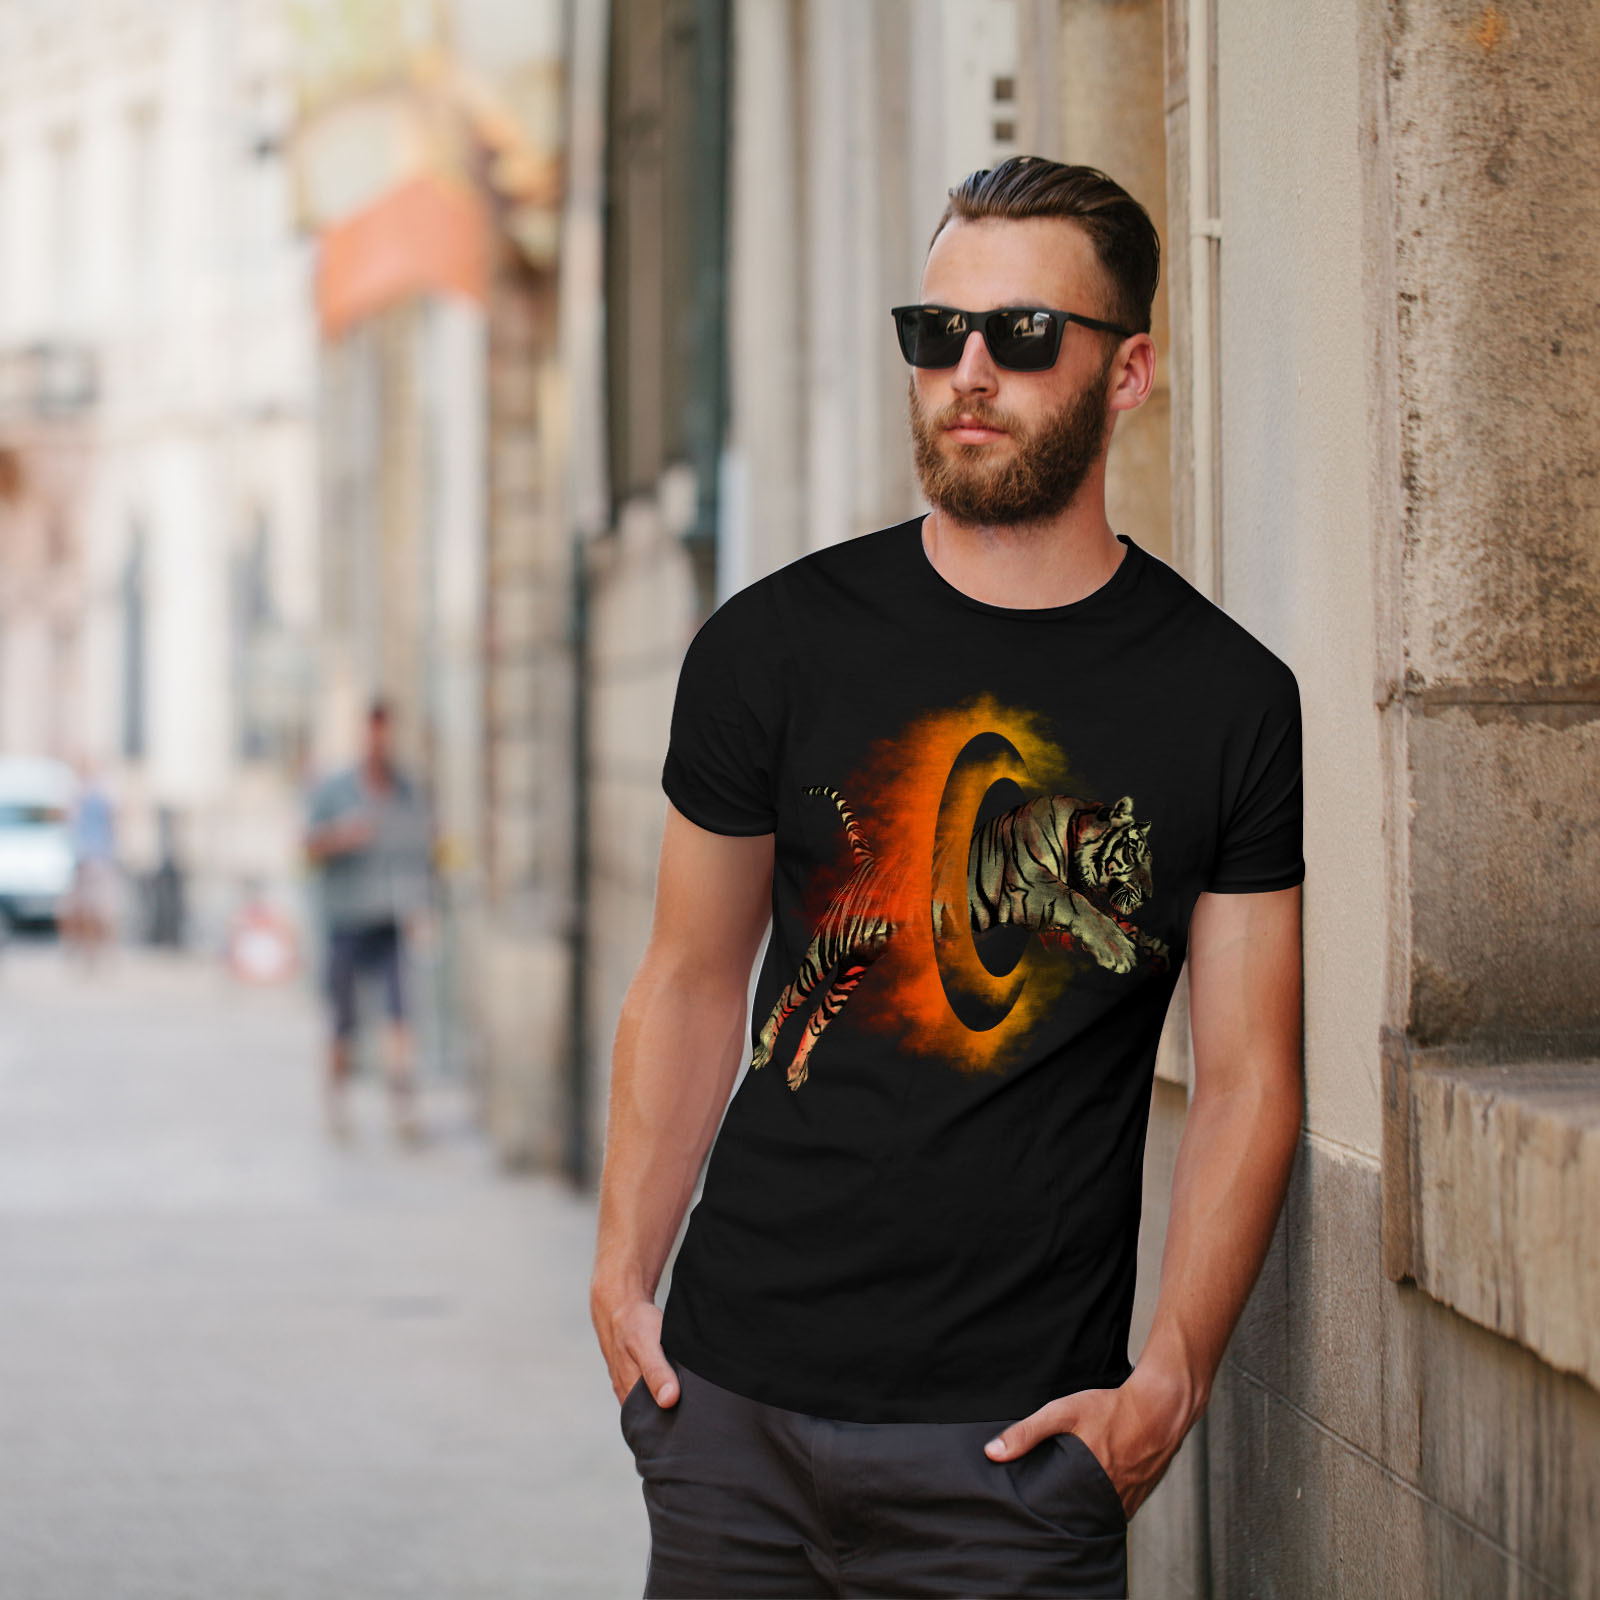 Wellcoda-Tiger-Portal-Cool-Mens-T-shirt-Flame-Graphic-Design-Printed-Tee thumbnail 5